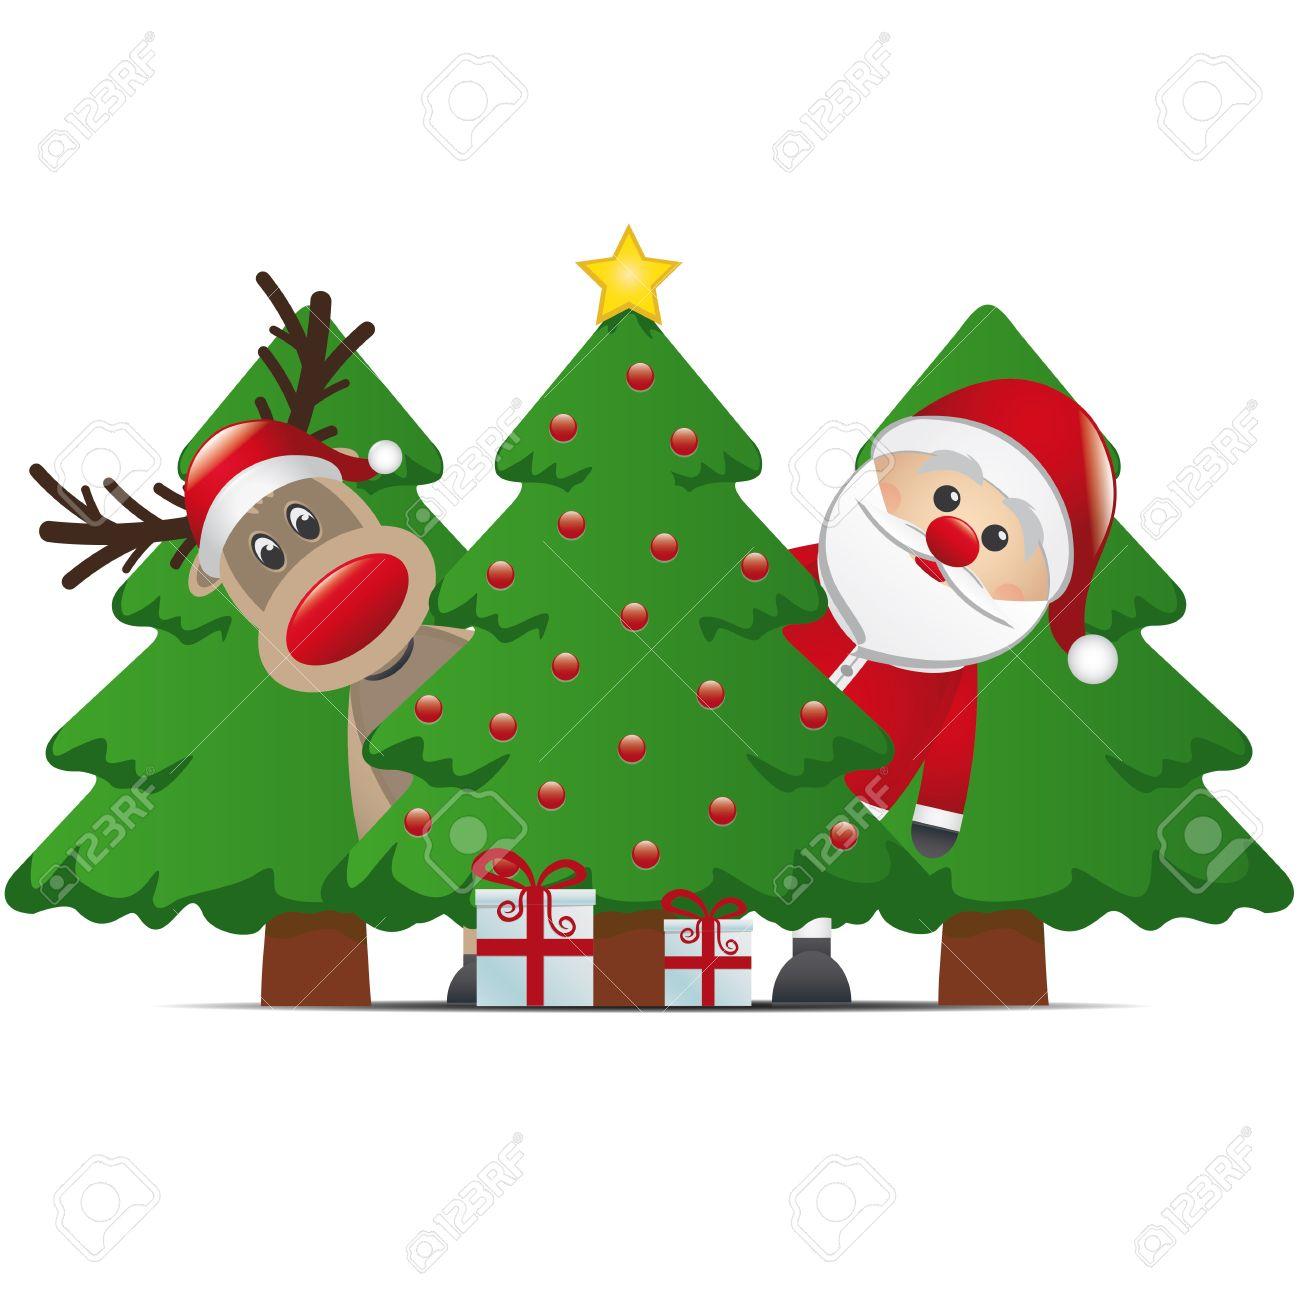 reindeer santa claus christmas tree gift box.